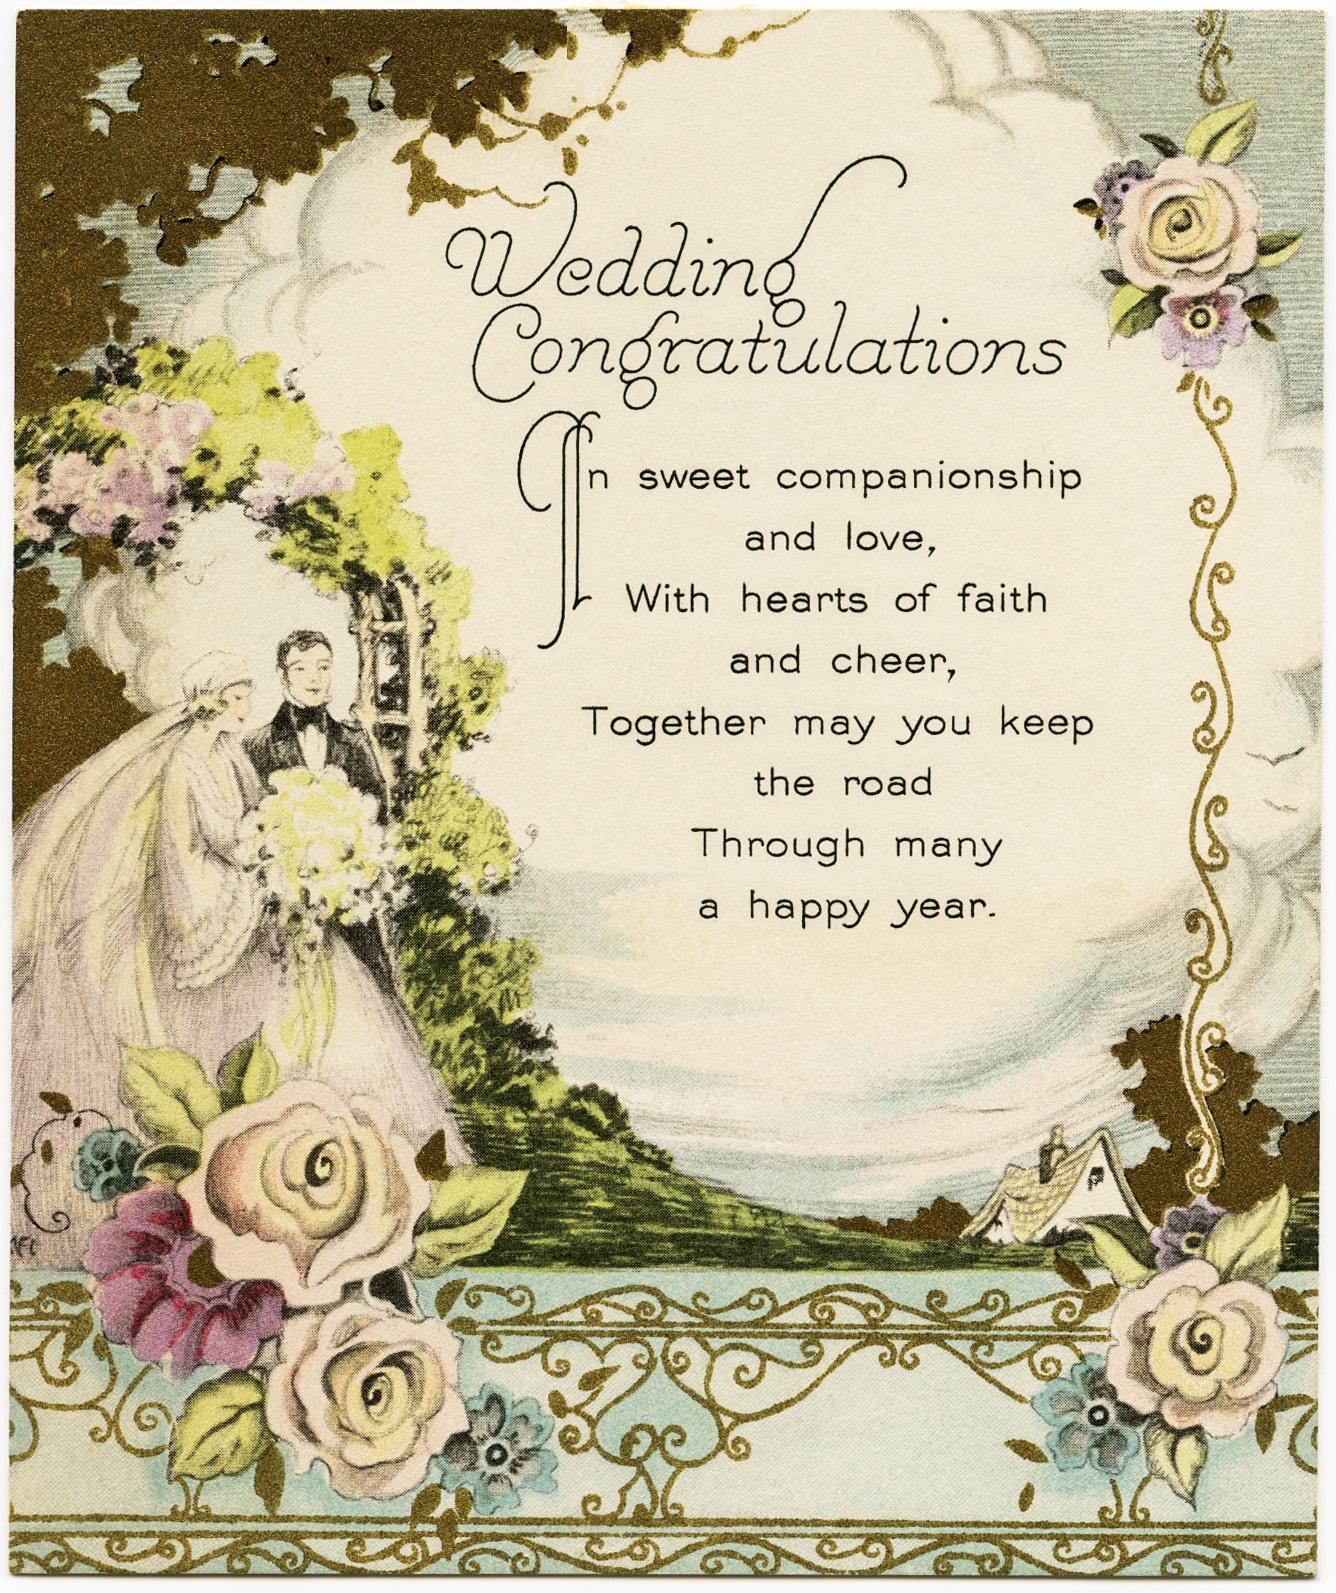 Vintage Wedding Congratulations - Old Design Shop Blog - Wedding Wish Cards Printable Free